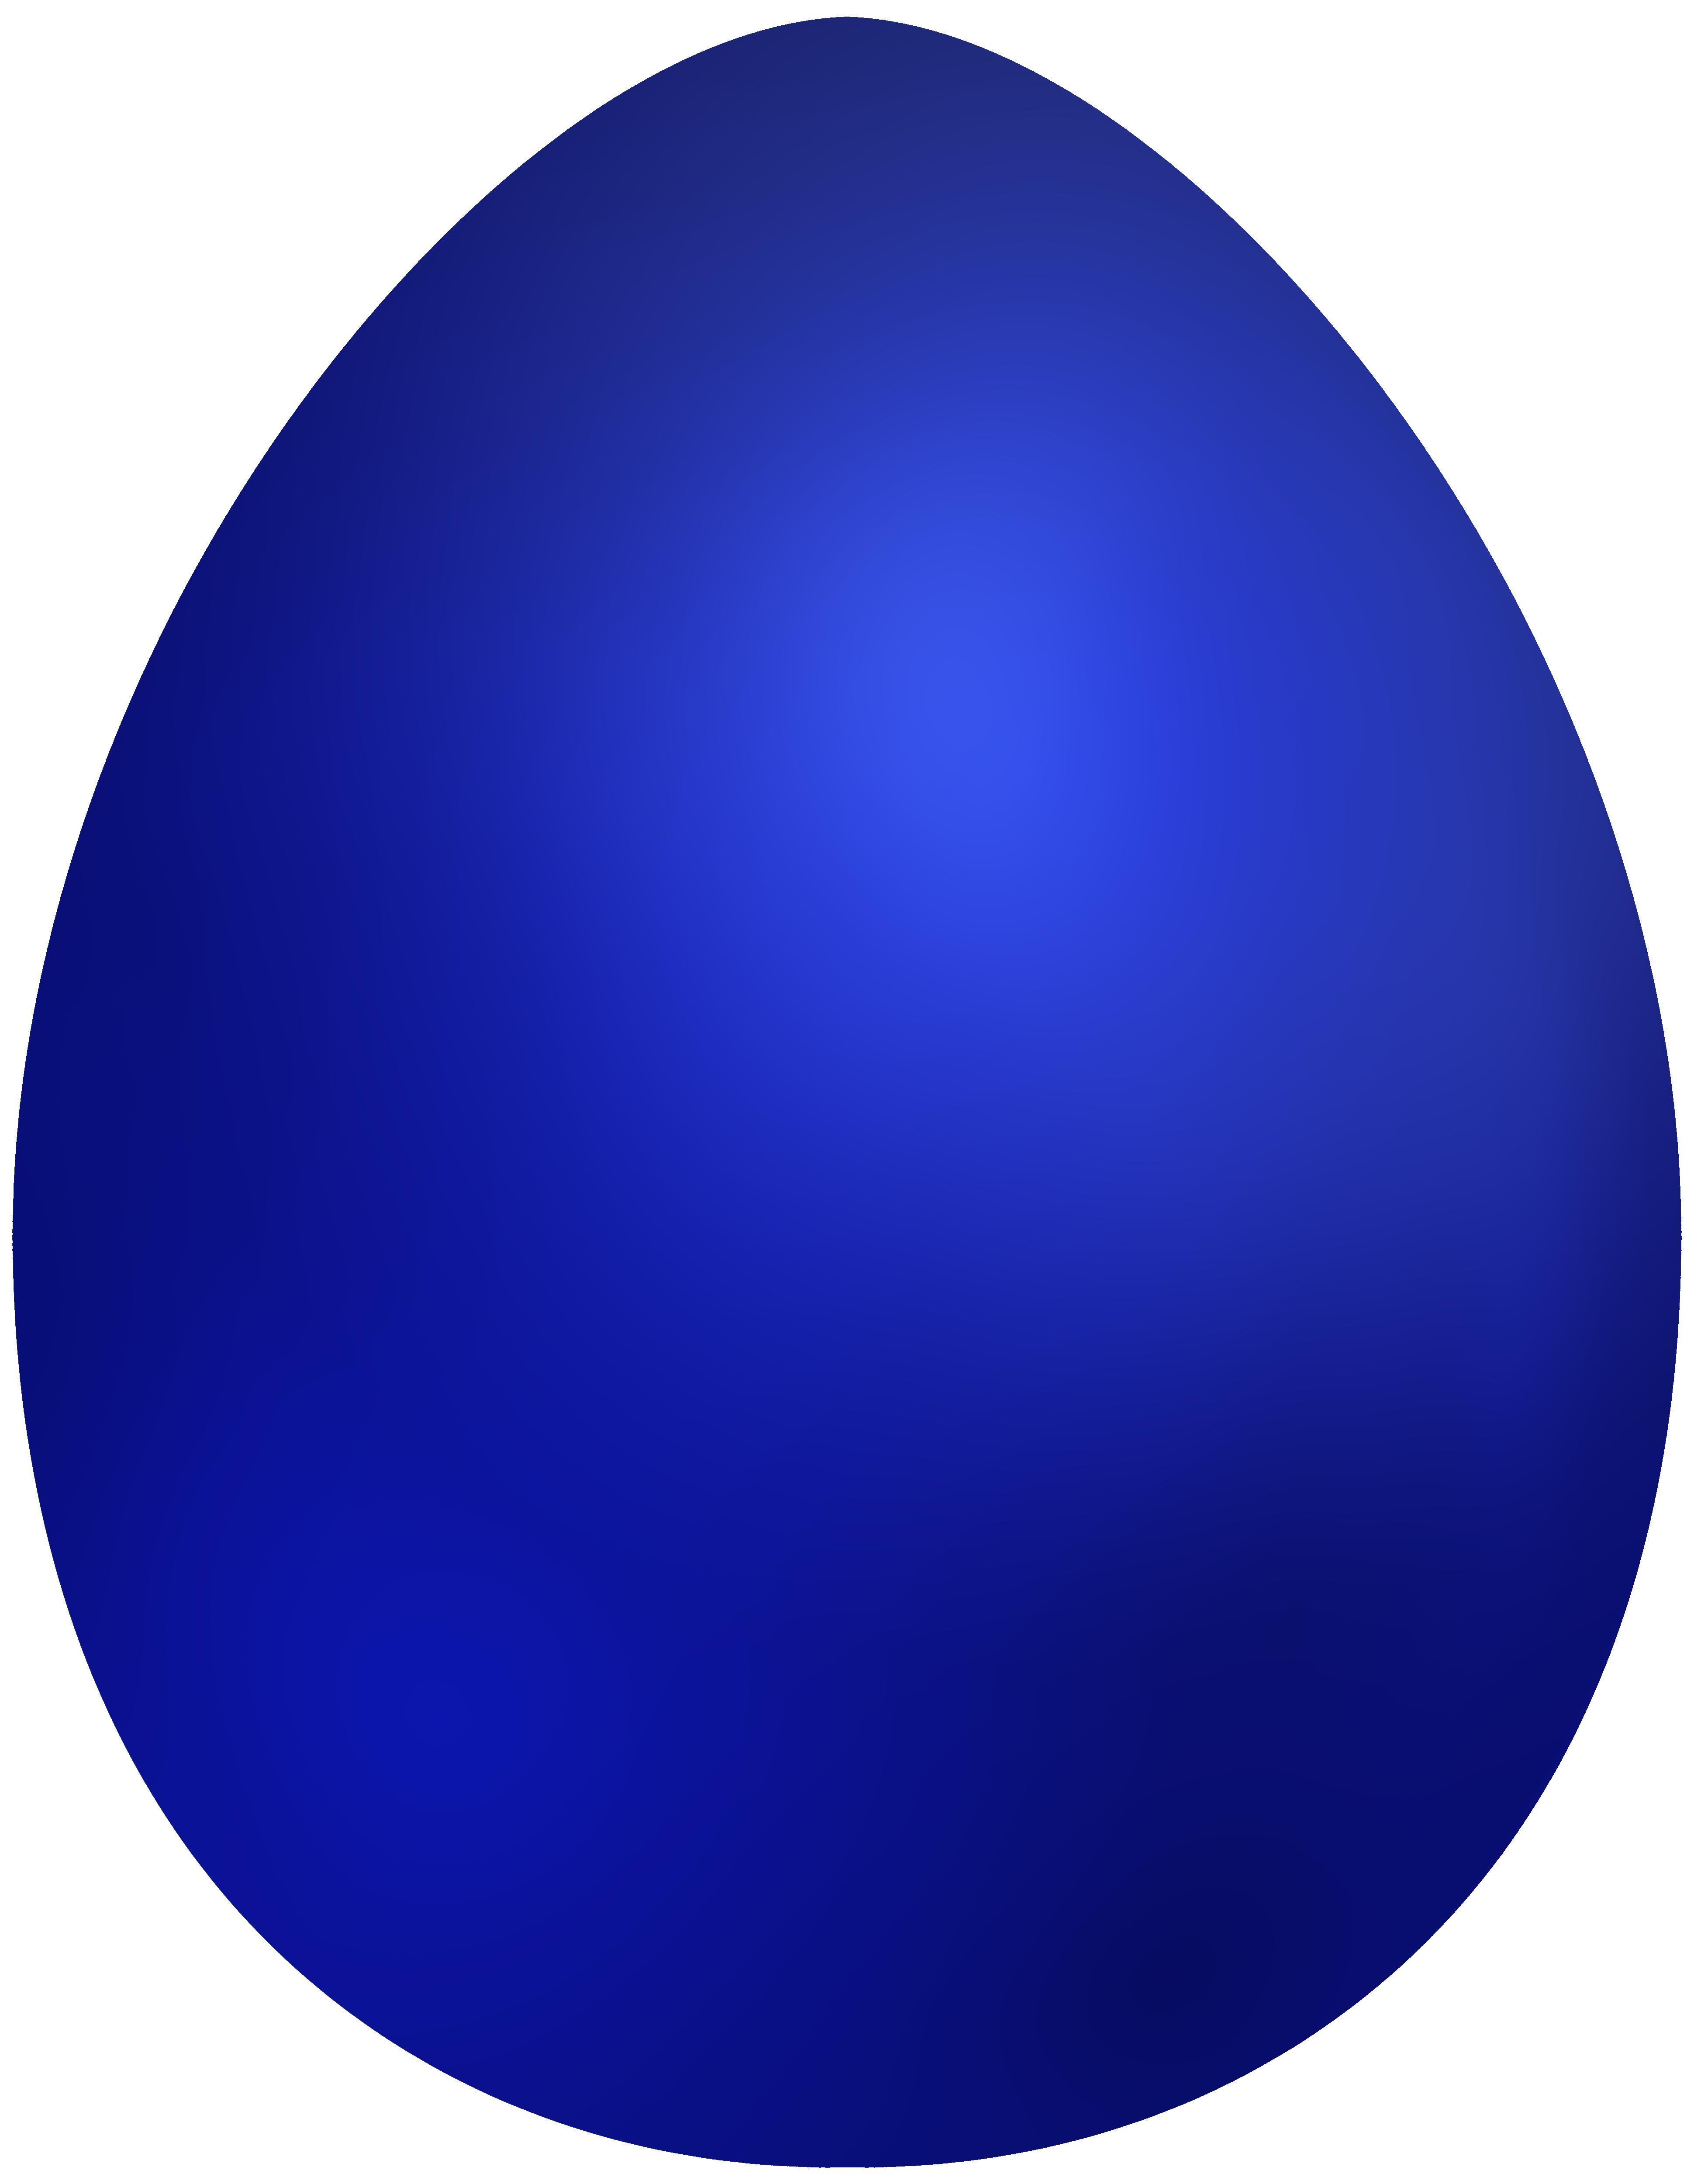 Blue clipart easter egg. Png clip art best